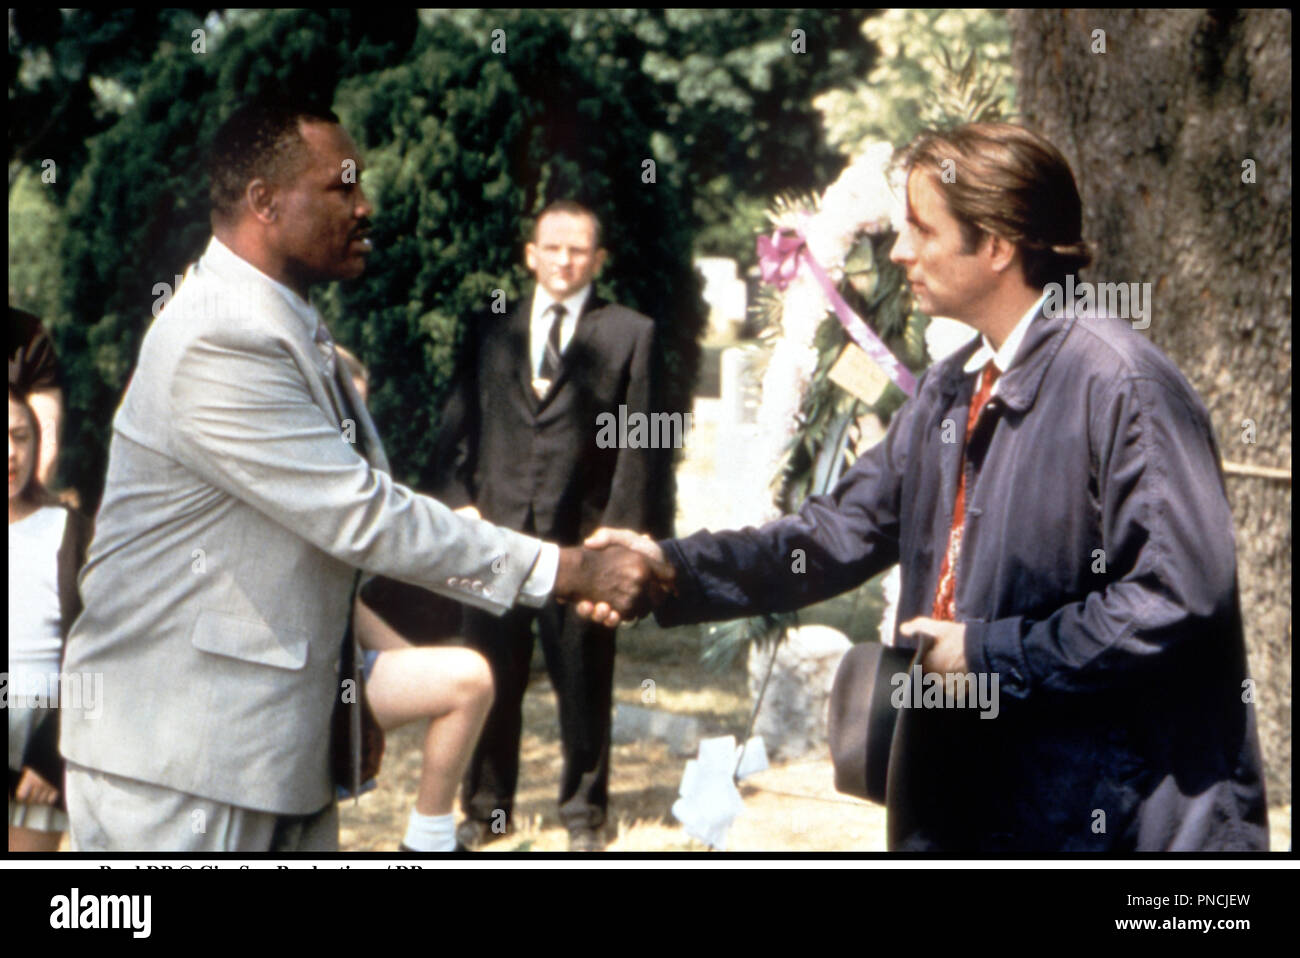 Prod DB © CineSon Productions / DR GARY ET LINDA (JUST THE TICKET) de Richard Wenck 1999 USA avec Joe Frazier et Andy Garcia  saluer, poignŽe de main - Stock Image